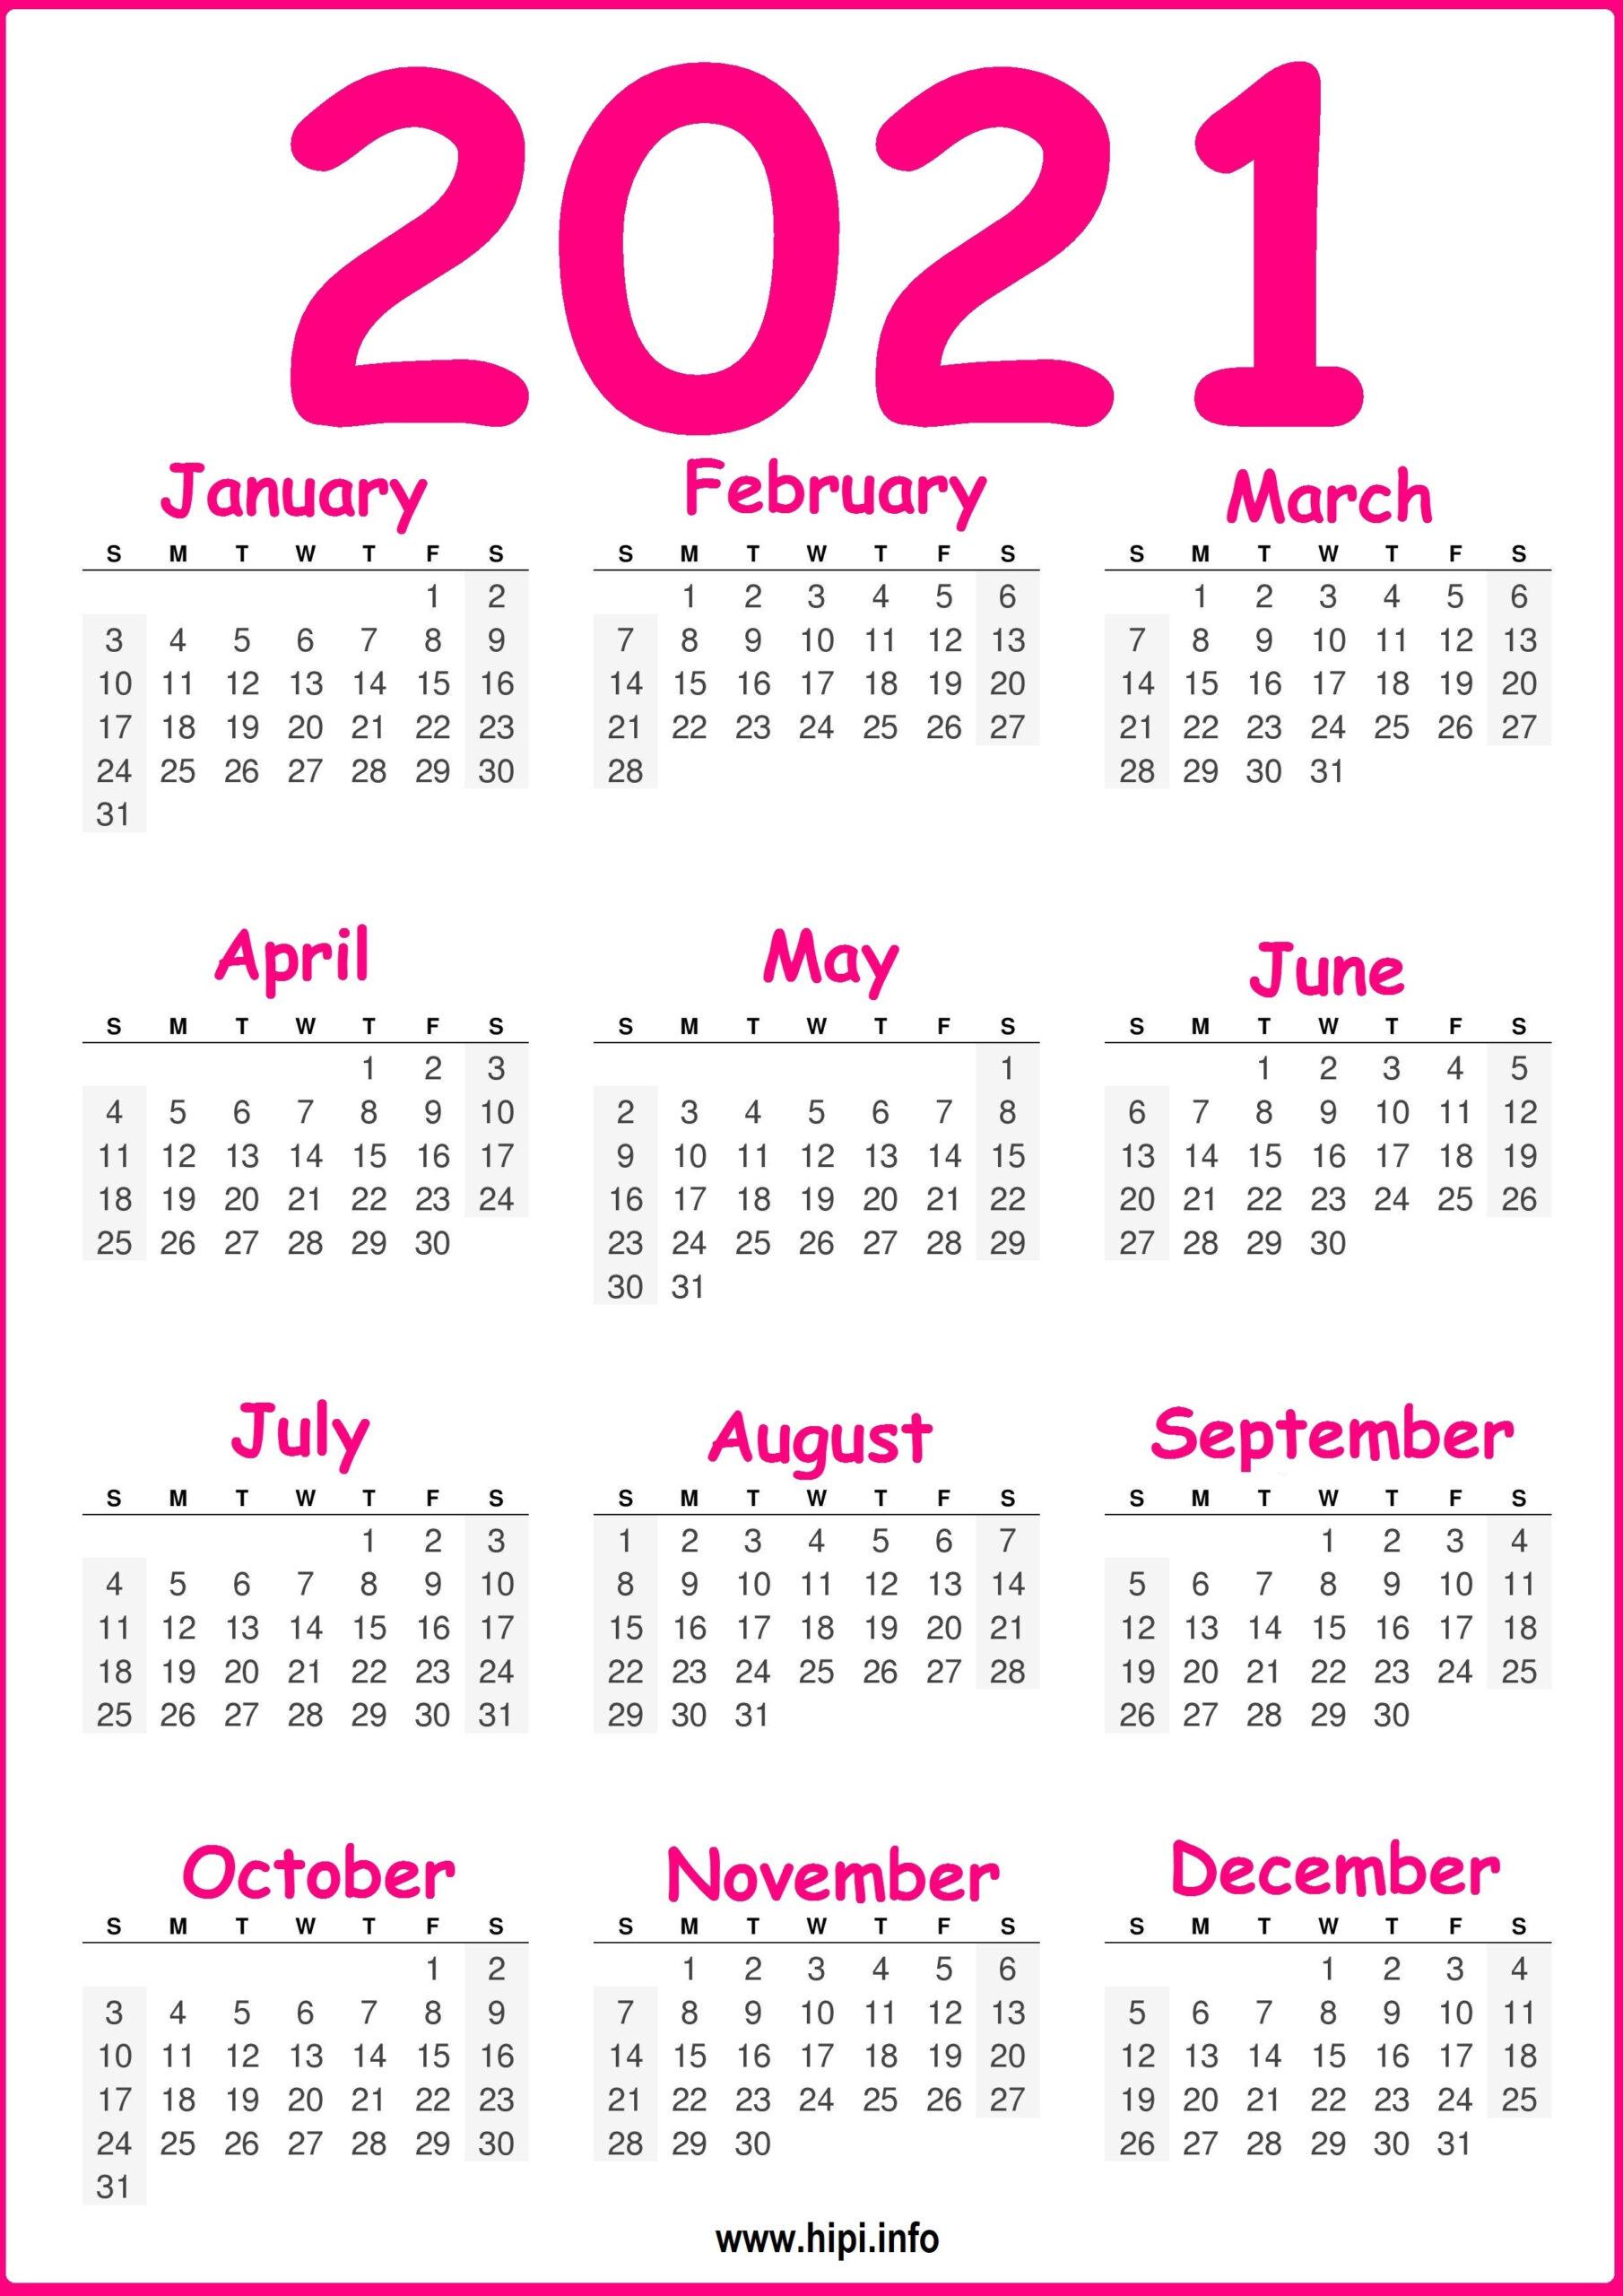 Free Printable 2021 Calendar, Pink And Green - Hipi  Free 2021 Calendar Printable